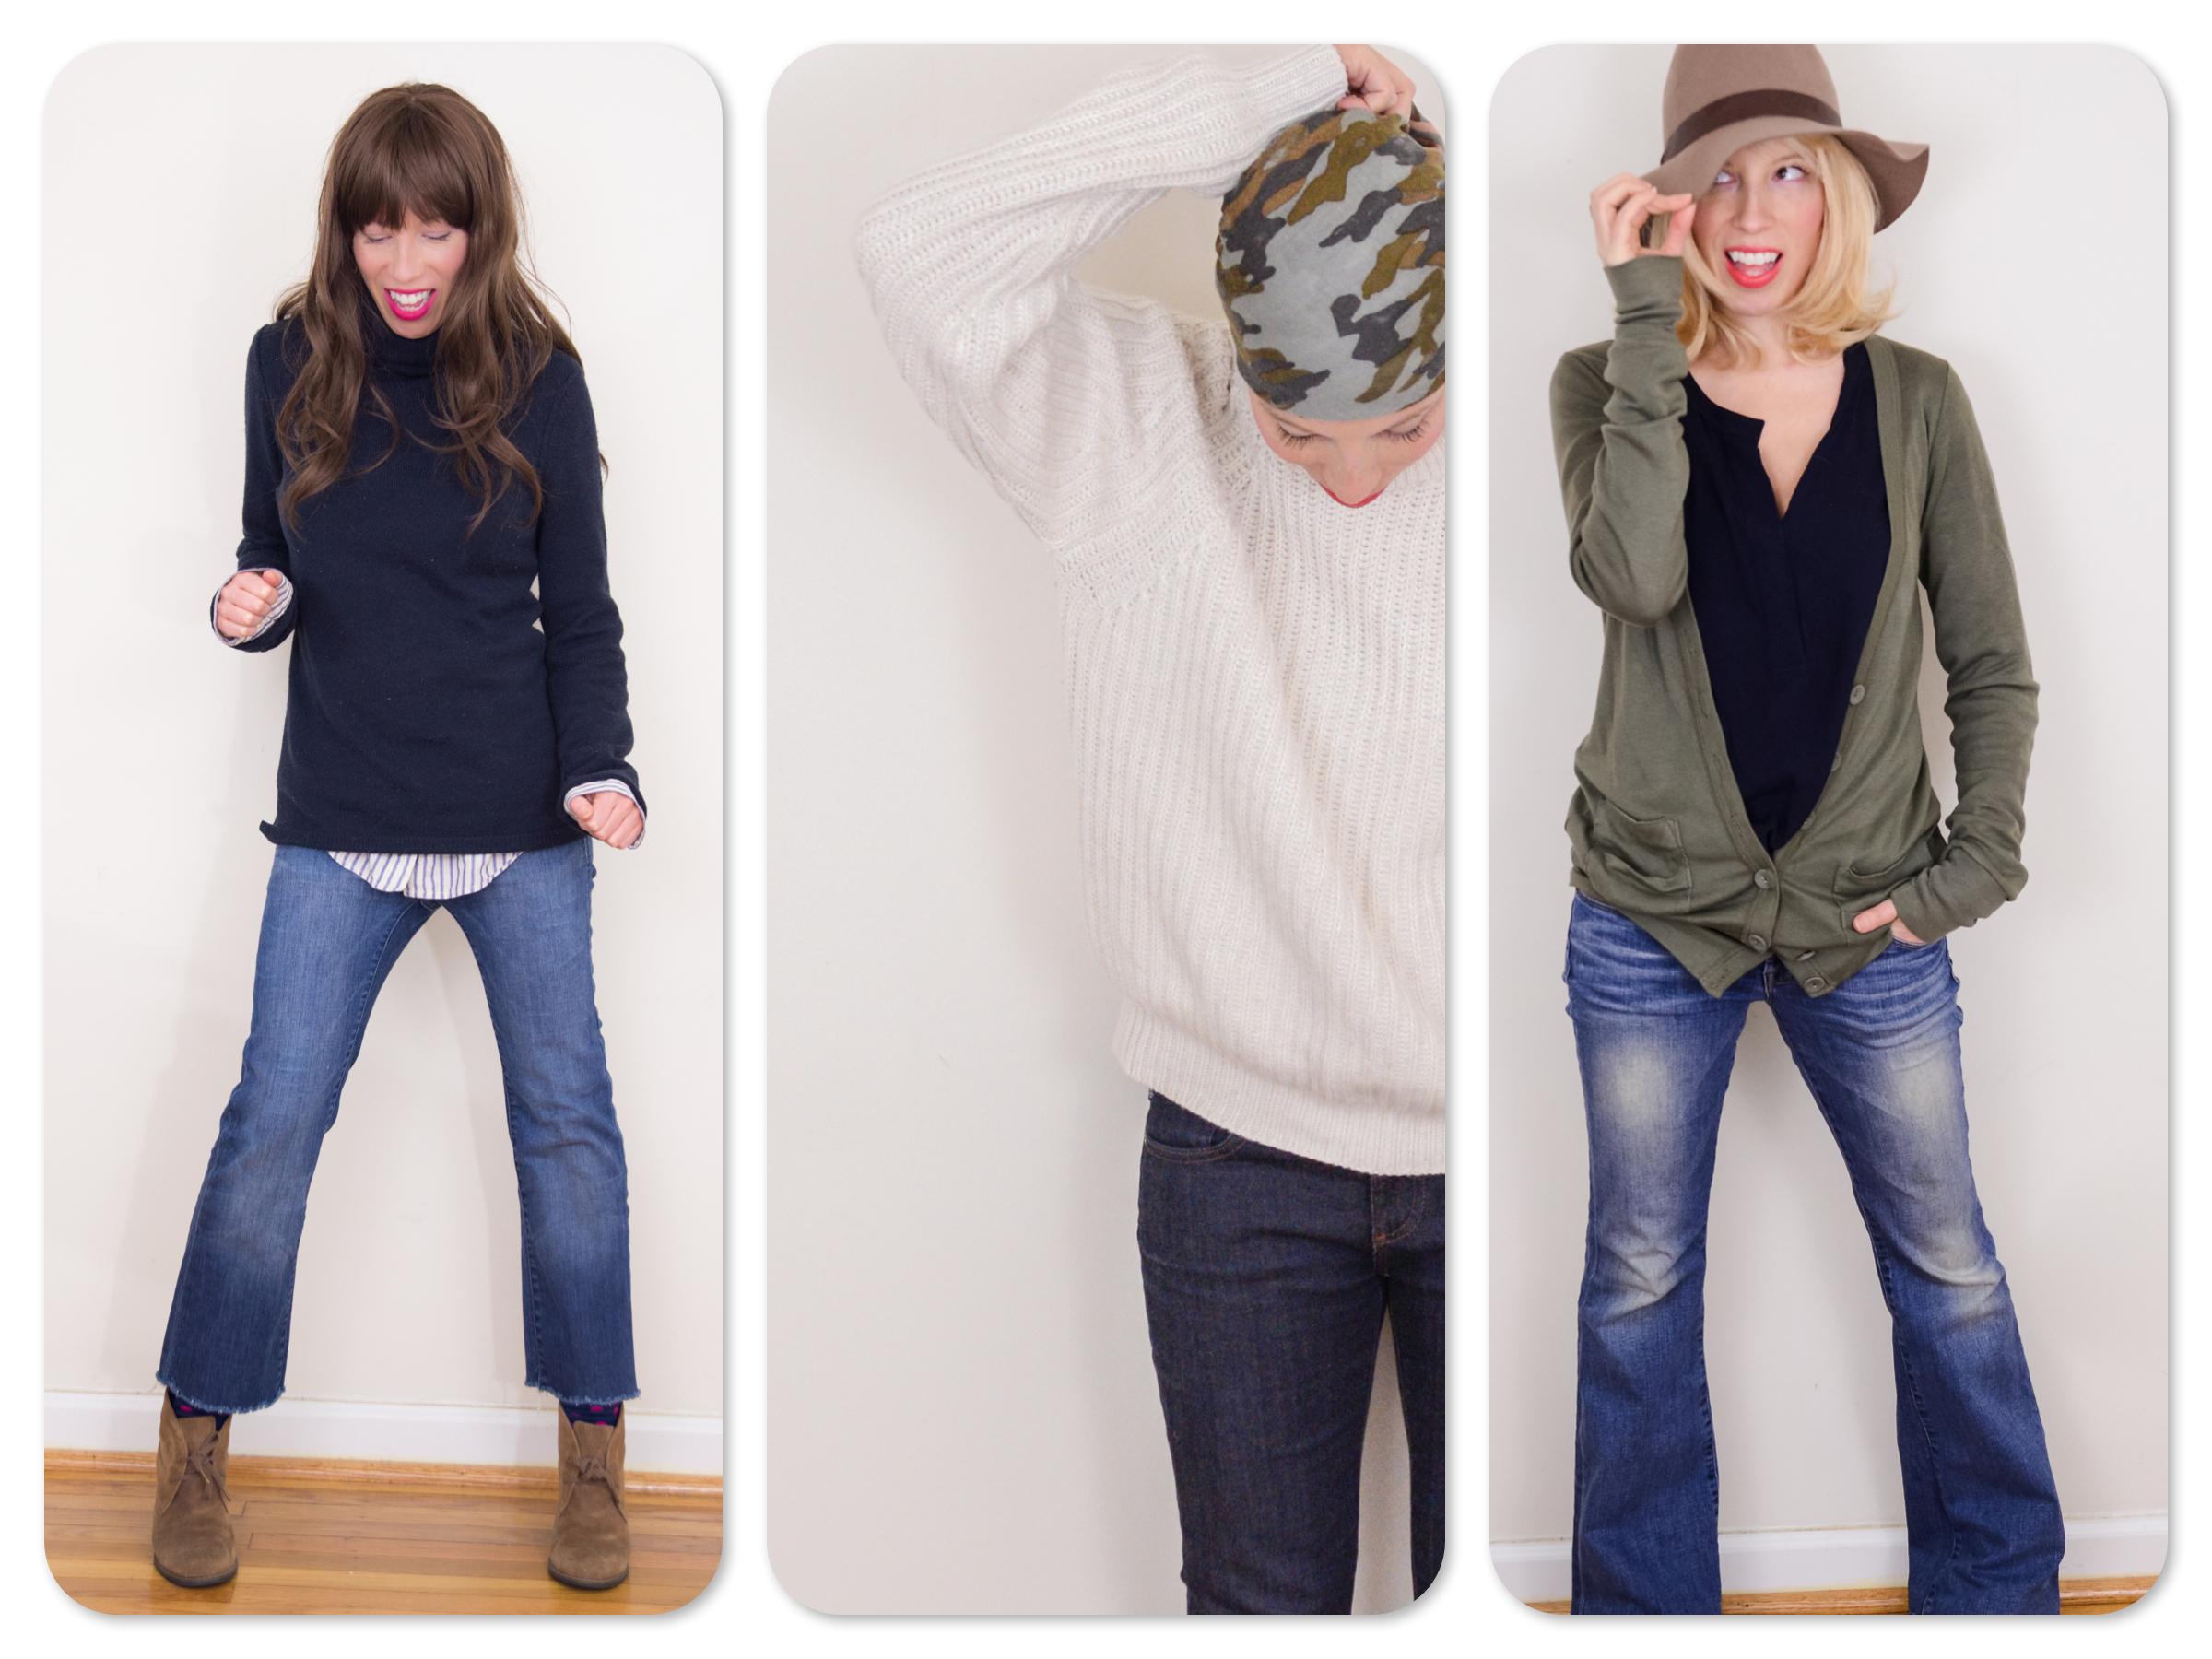 Clothing Websites For Girls